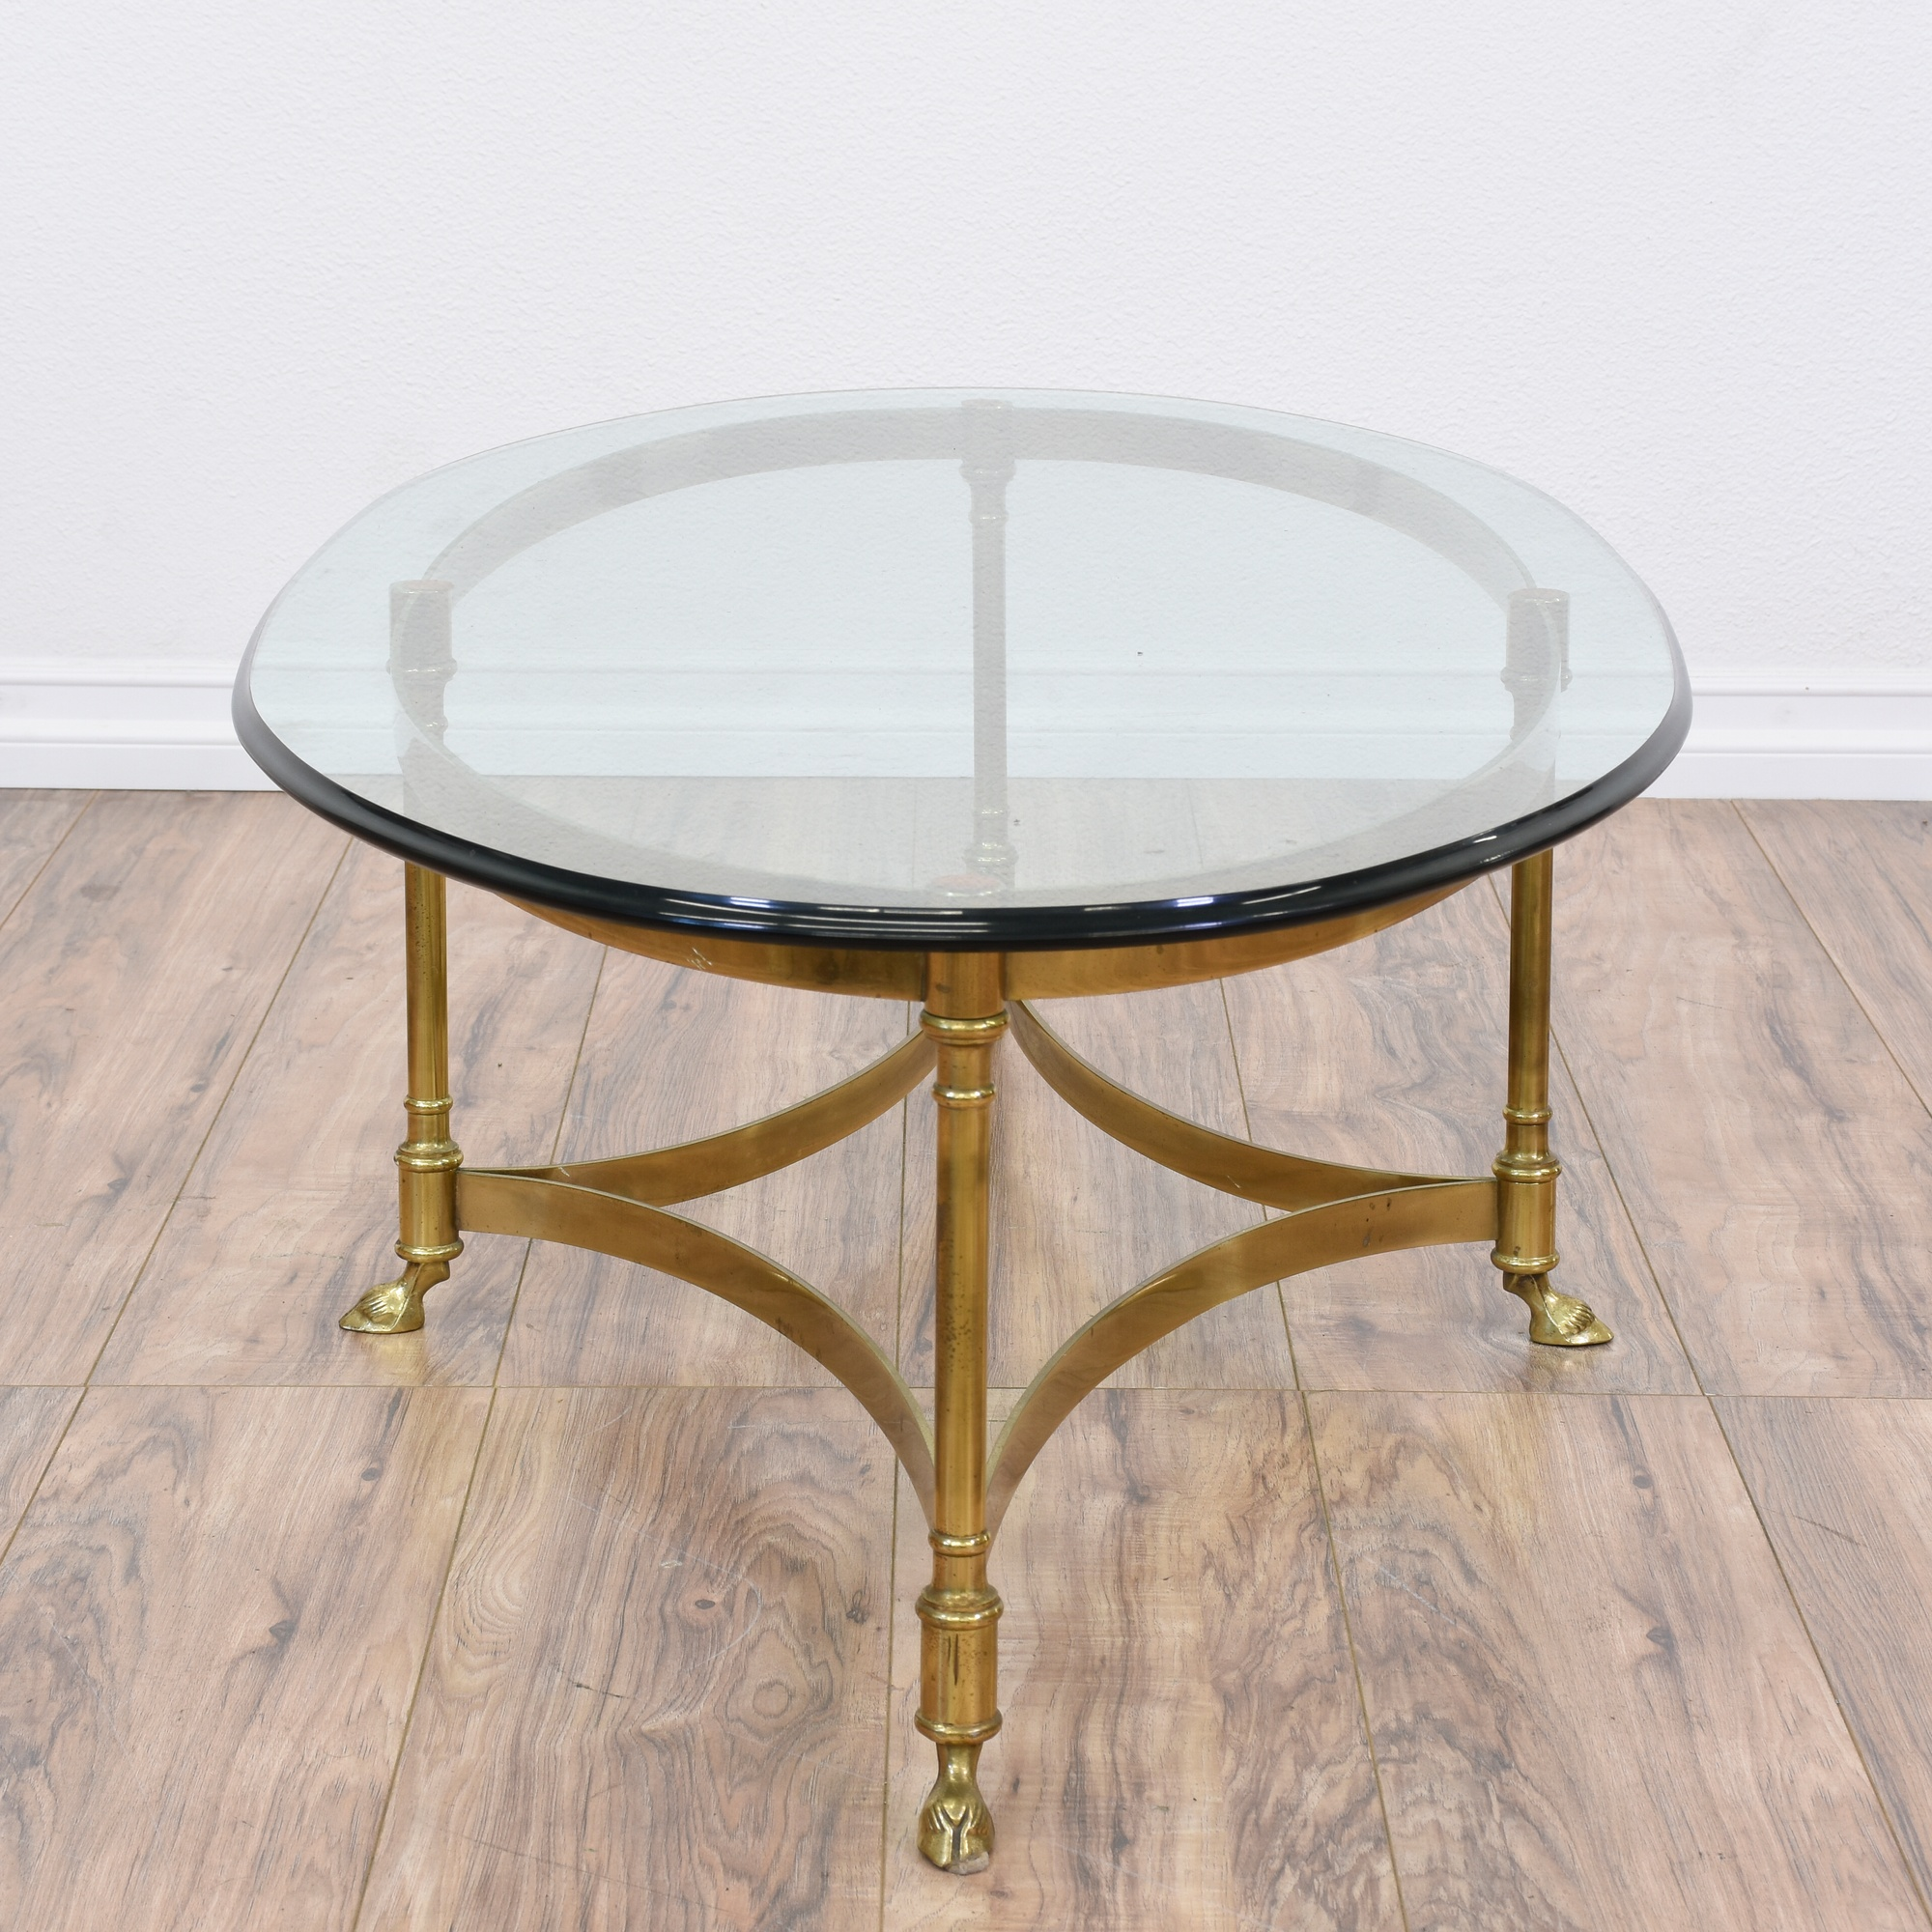 Hollywood Regency Brass Oval Coffee Table